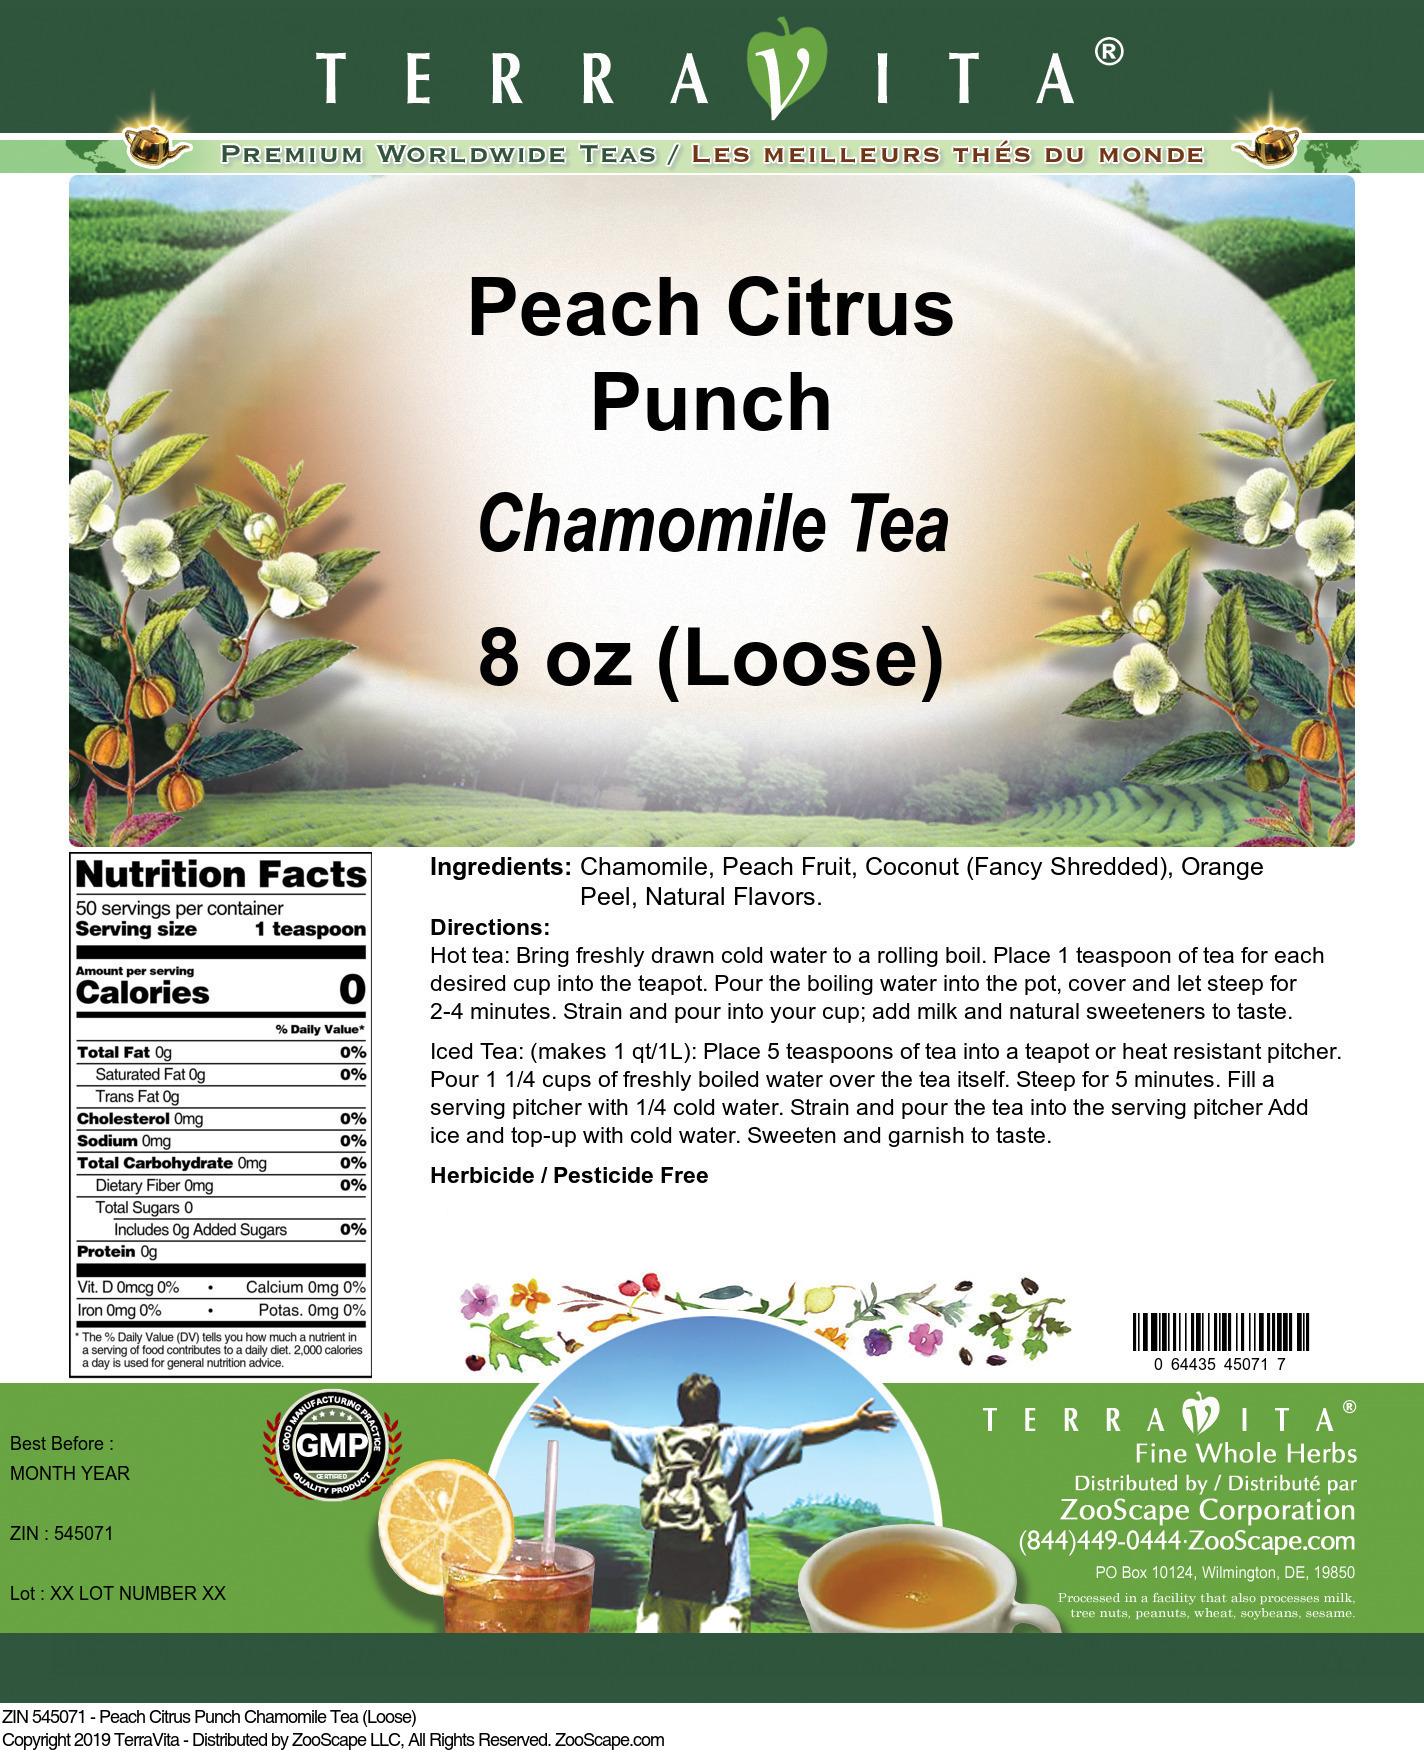 Peach Citrus Punch Chamomile Tea